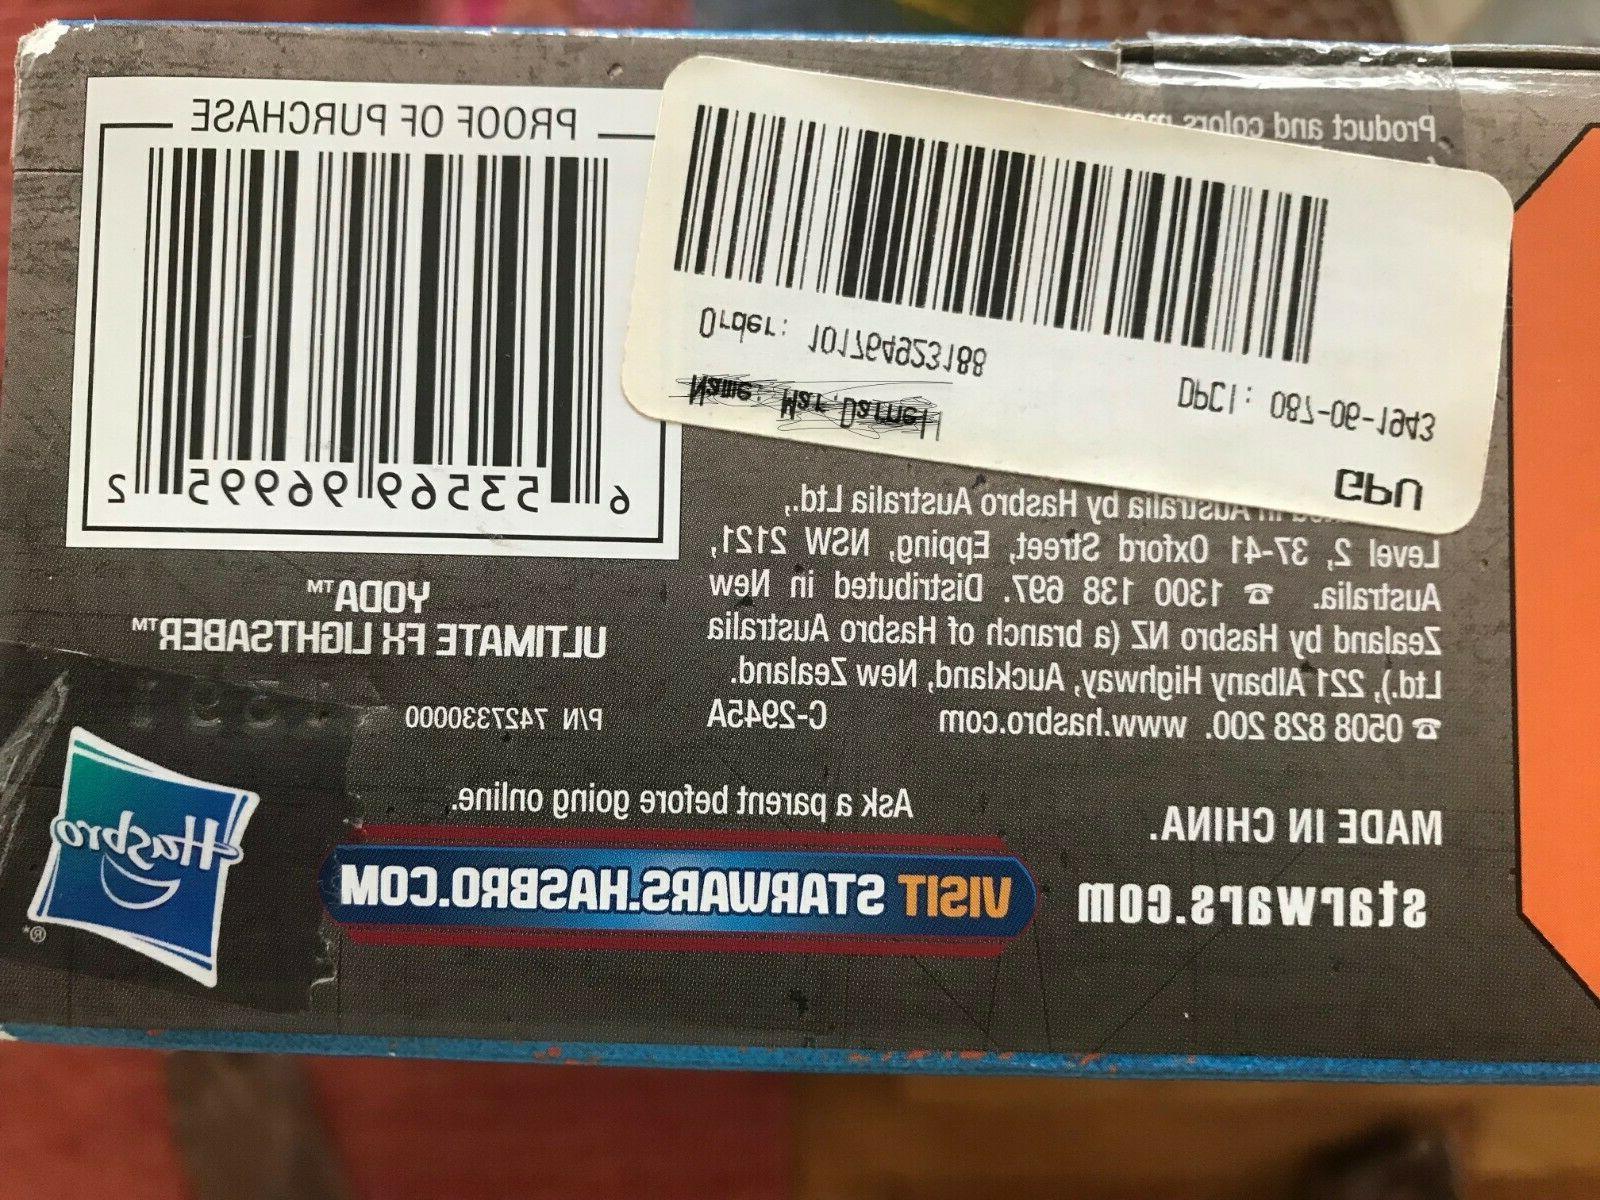 Ultimate Fx Lightsaber Hasbro NEW BOX FREE SHIPPING